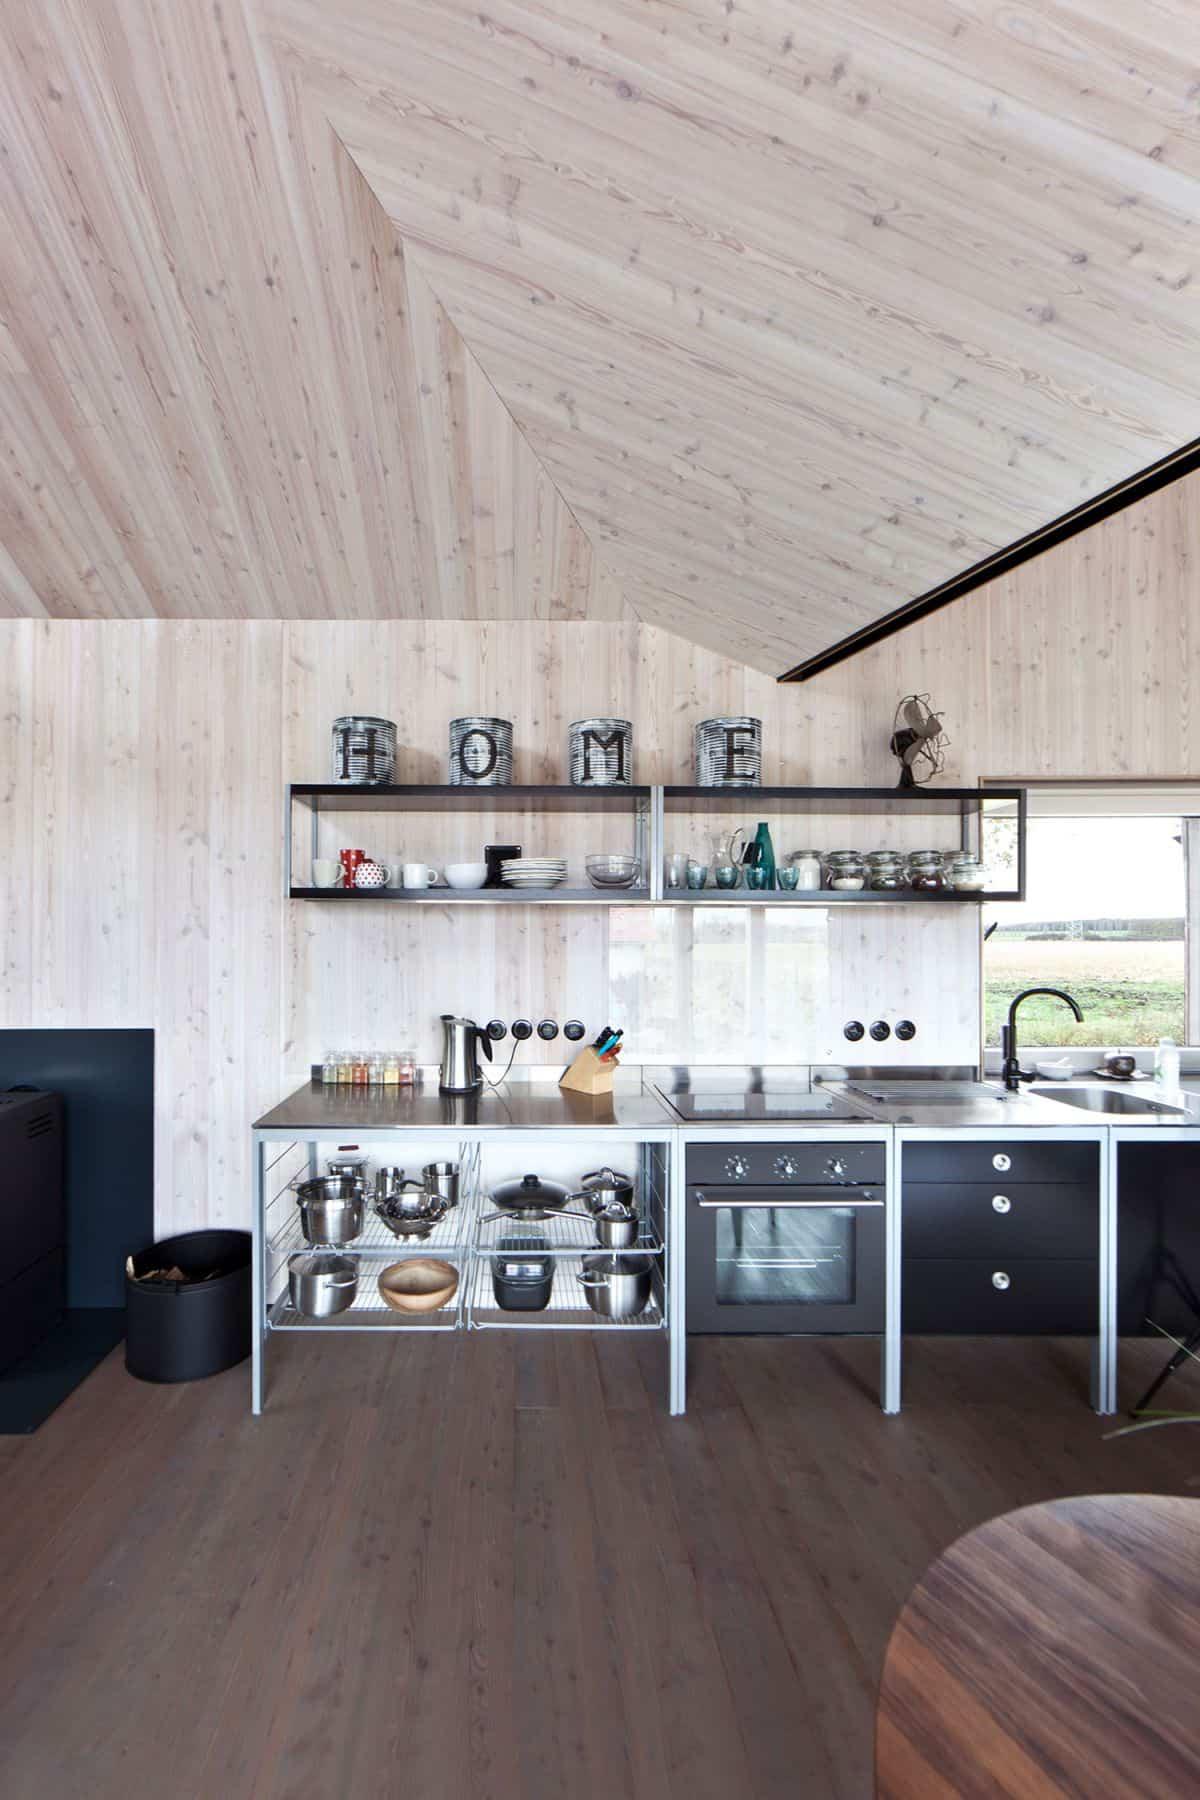 Casa de madera Zilvar cocina completa